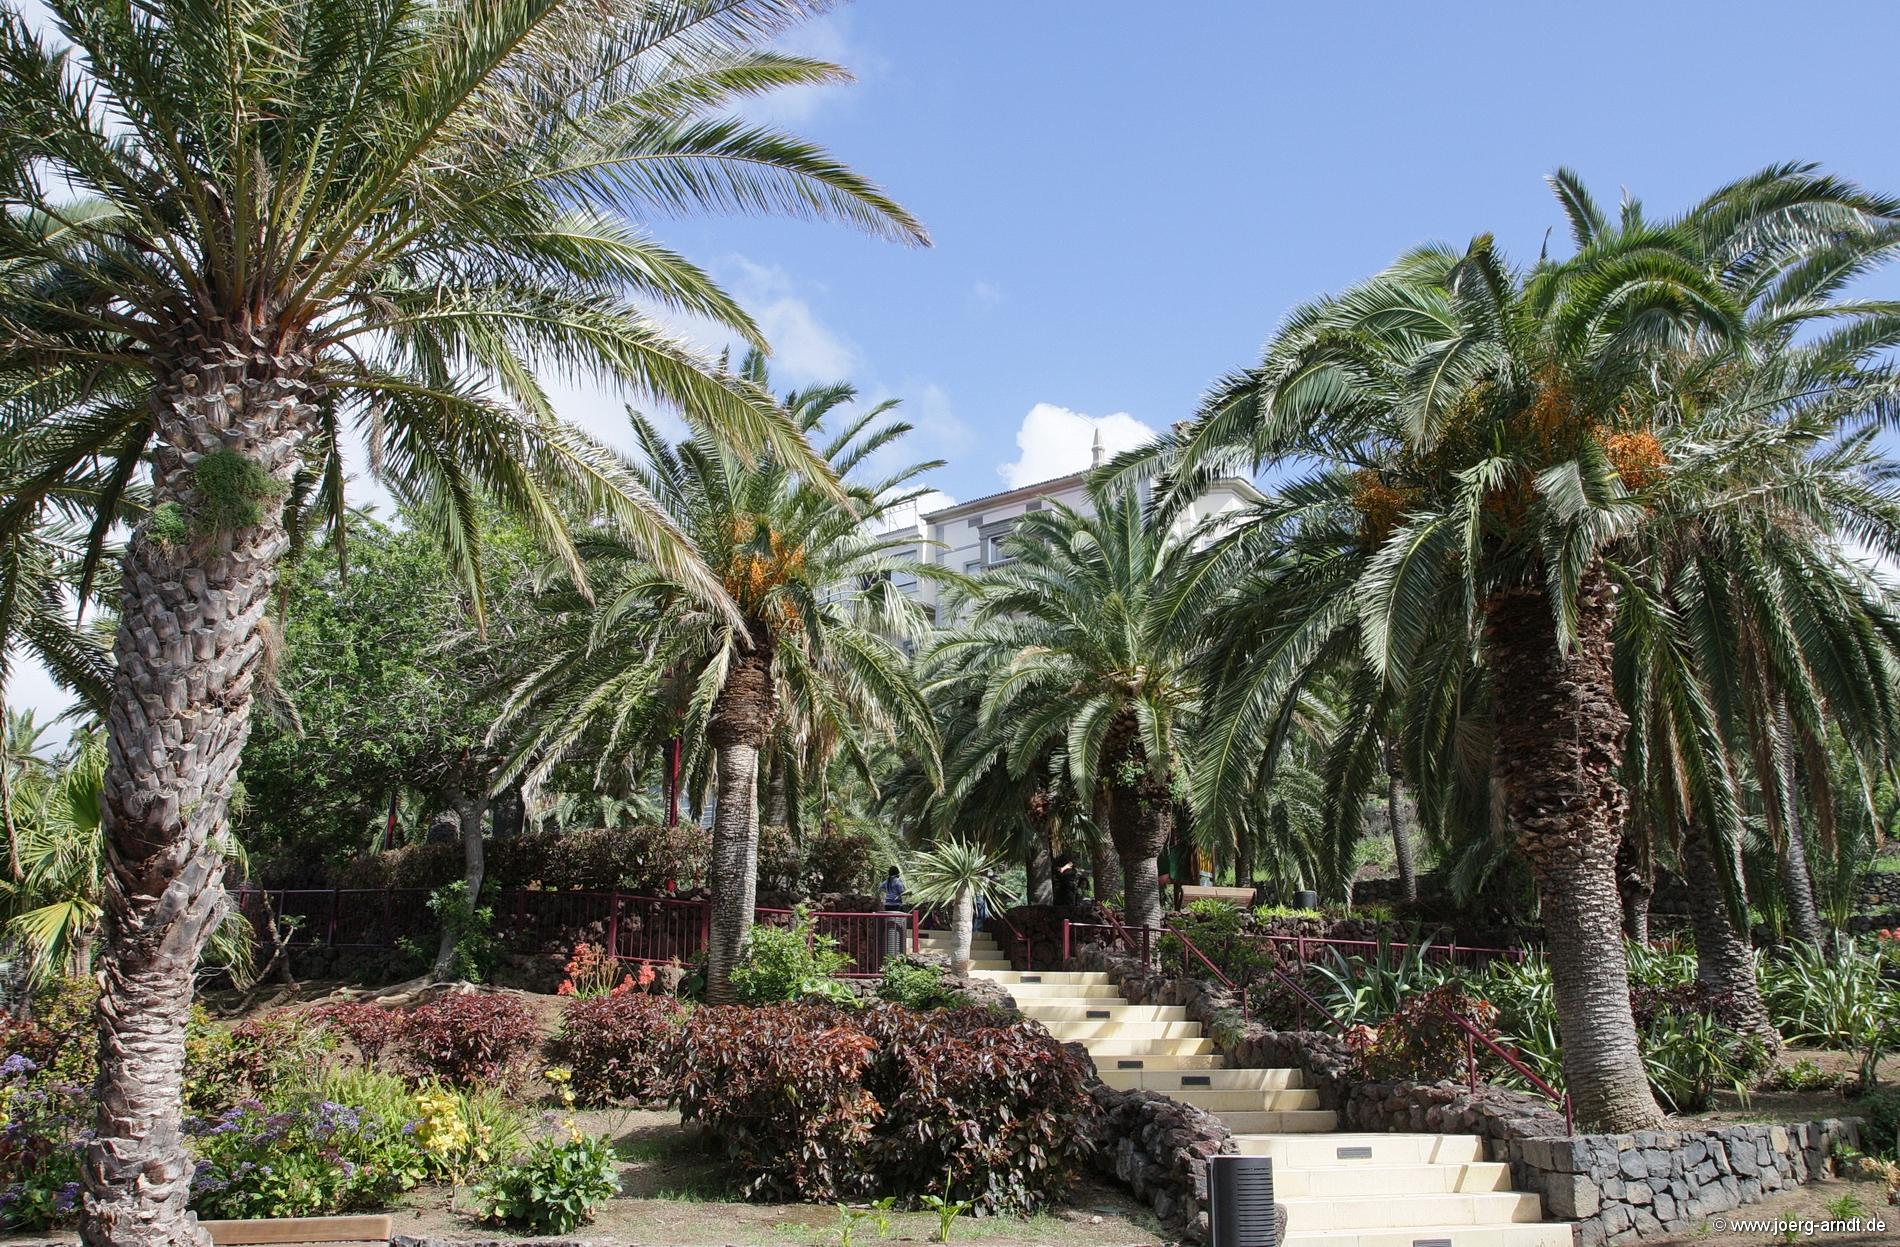 Der Taoro Park in Puerto de la Cruz.